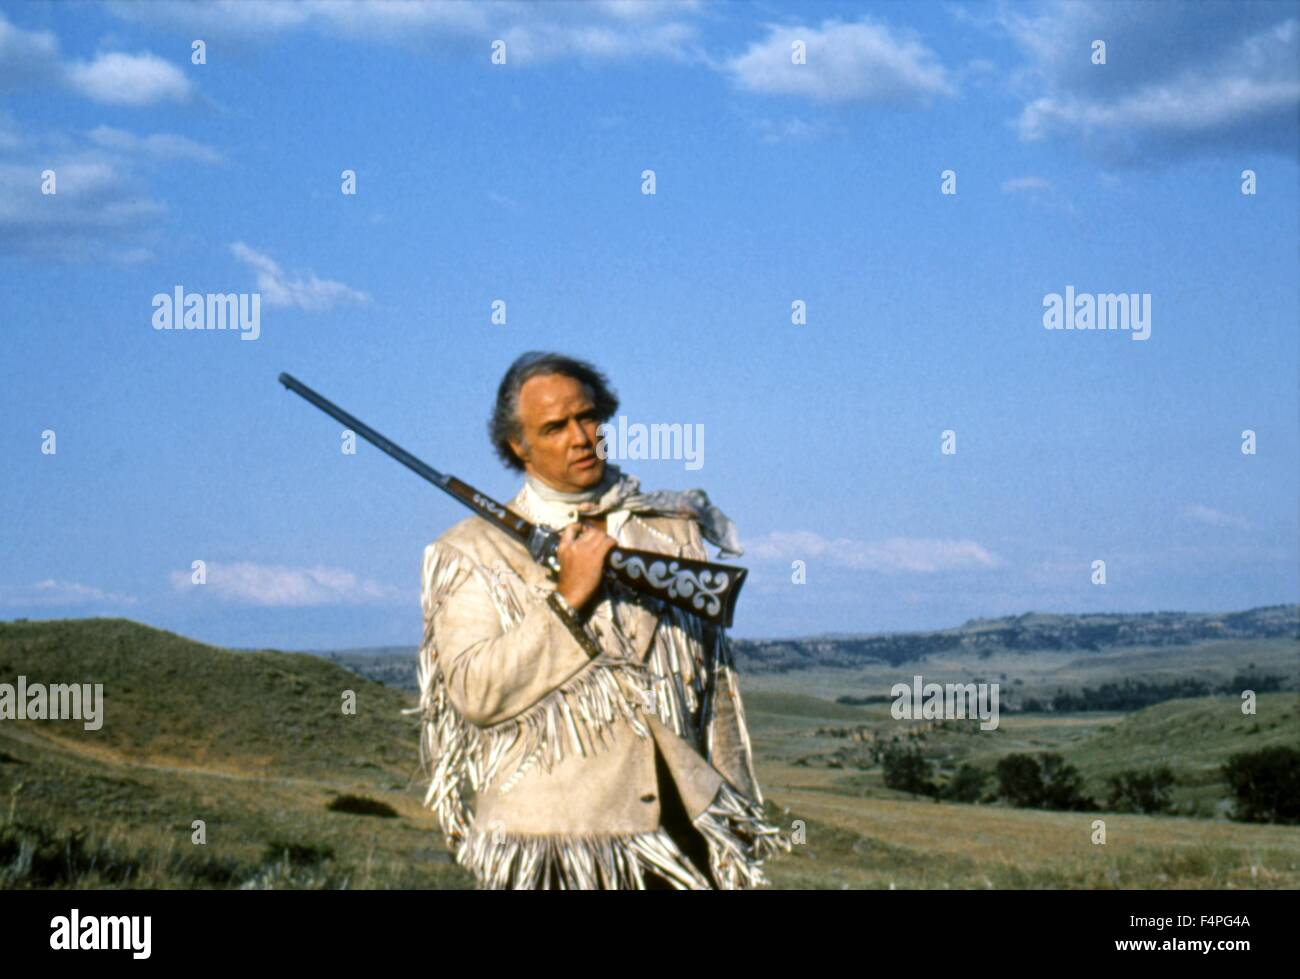 Marlon Brando / The Missouri Breaks / 1976 directed by  Arthur Penn - Stock Image